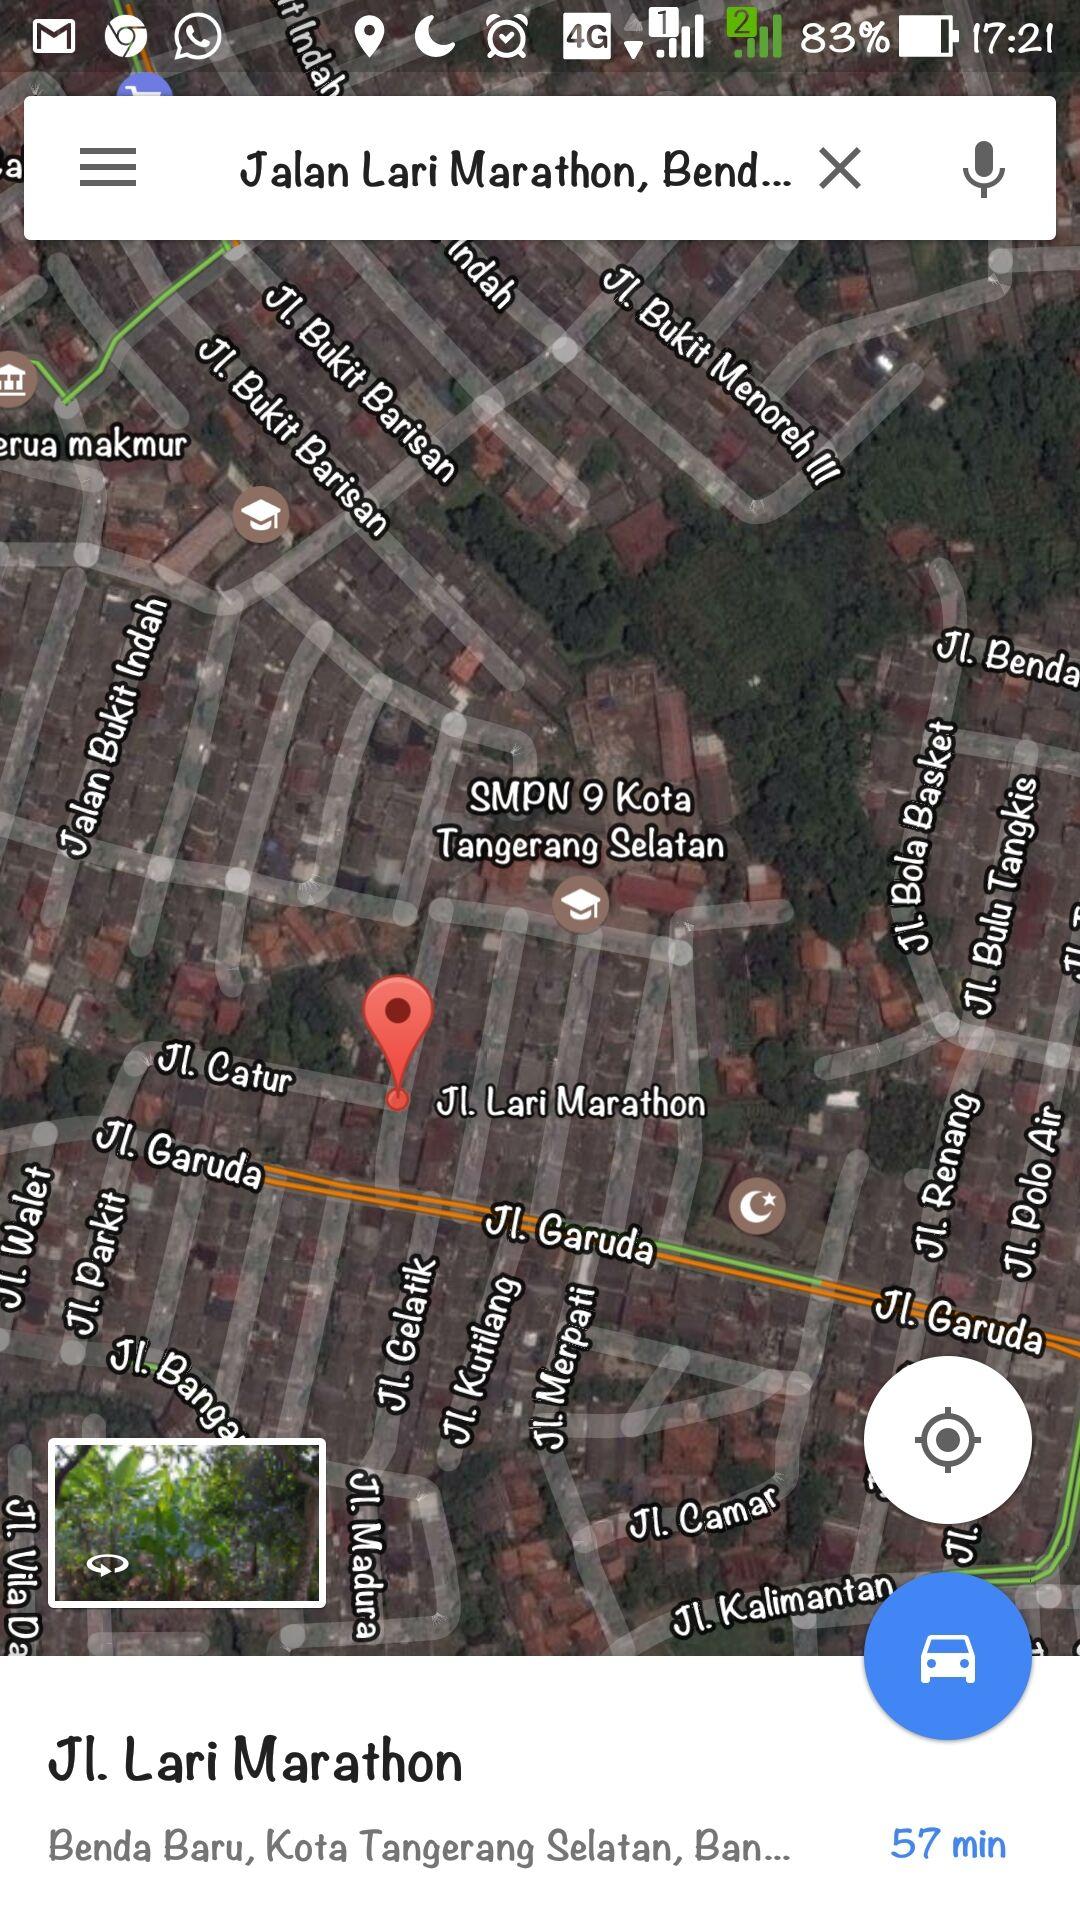 Nama Jalan Aneh Di Google Maps 1